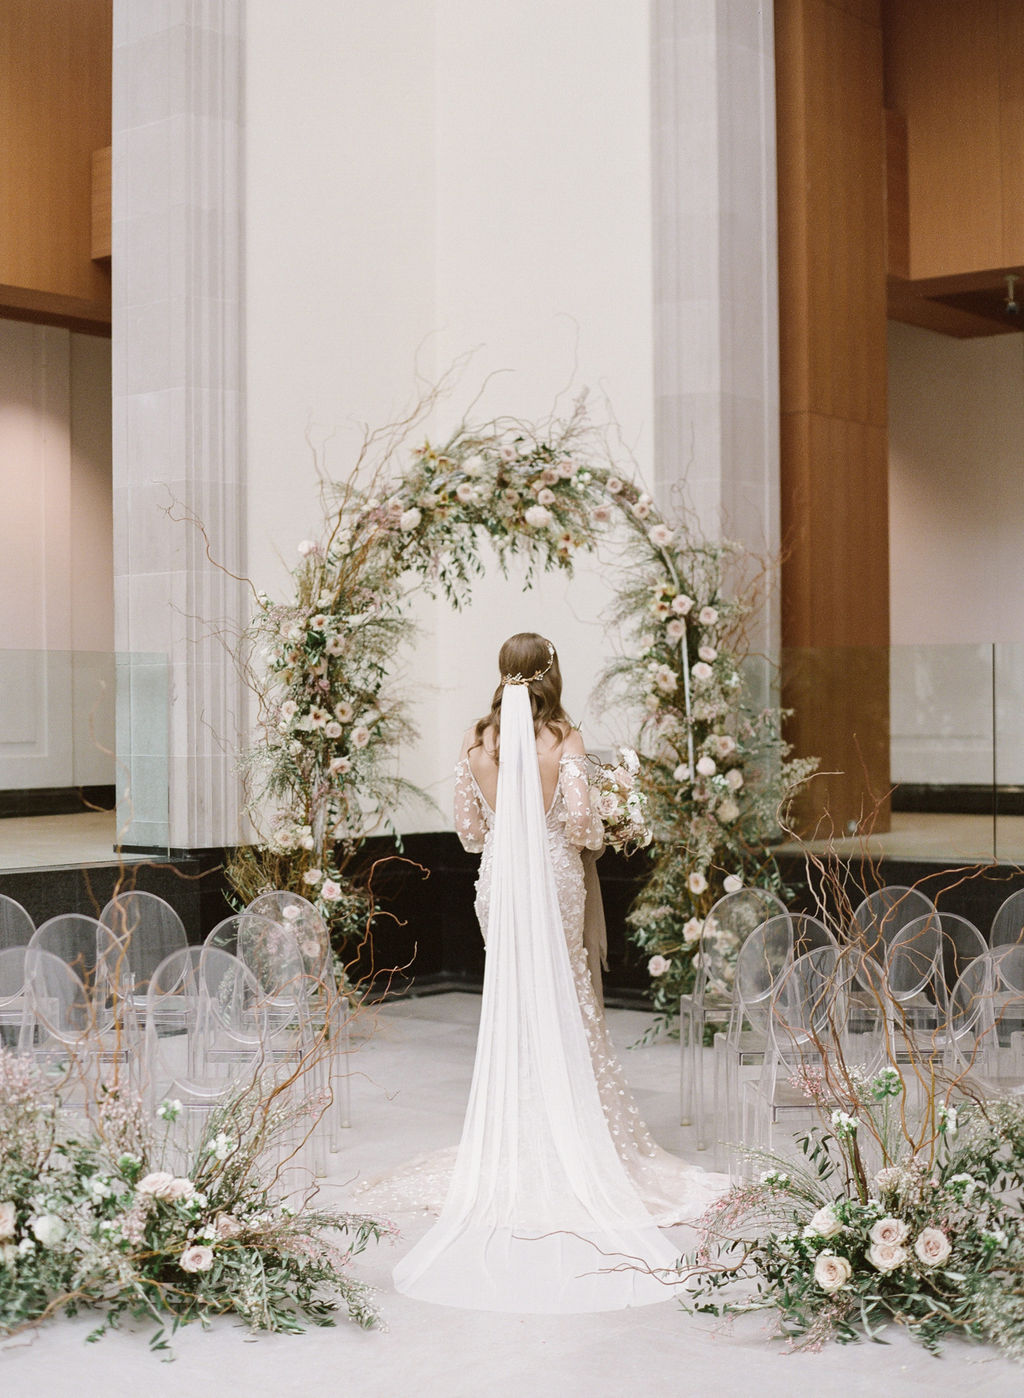 artiese-ago-wedding-editorial-000423590013.jpg